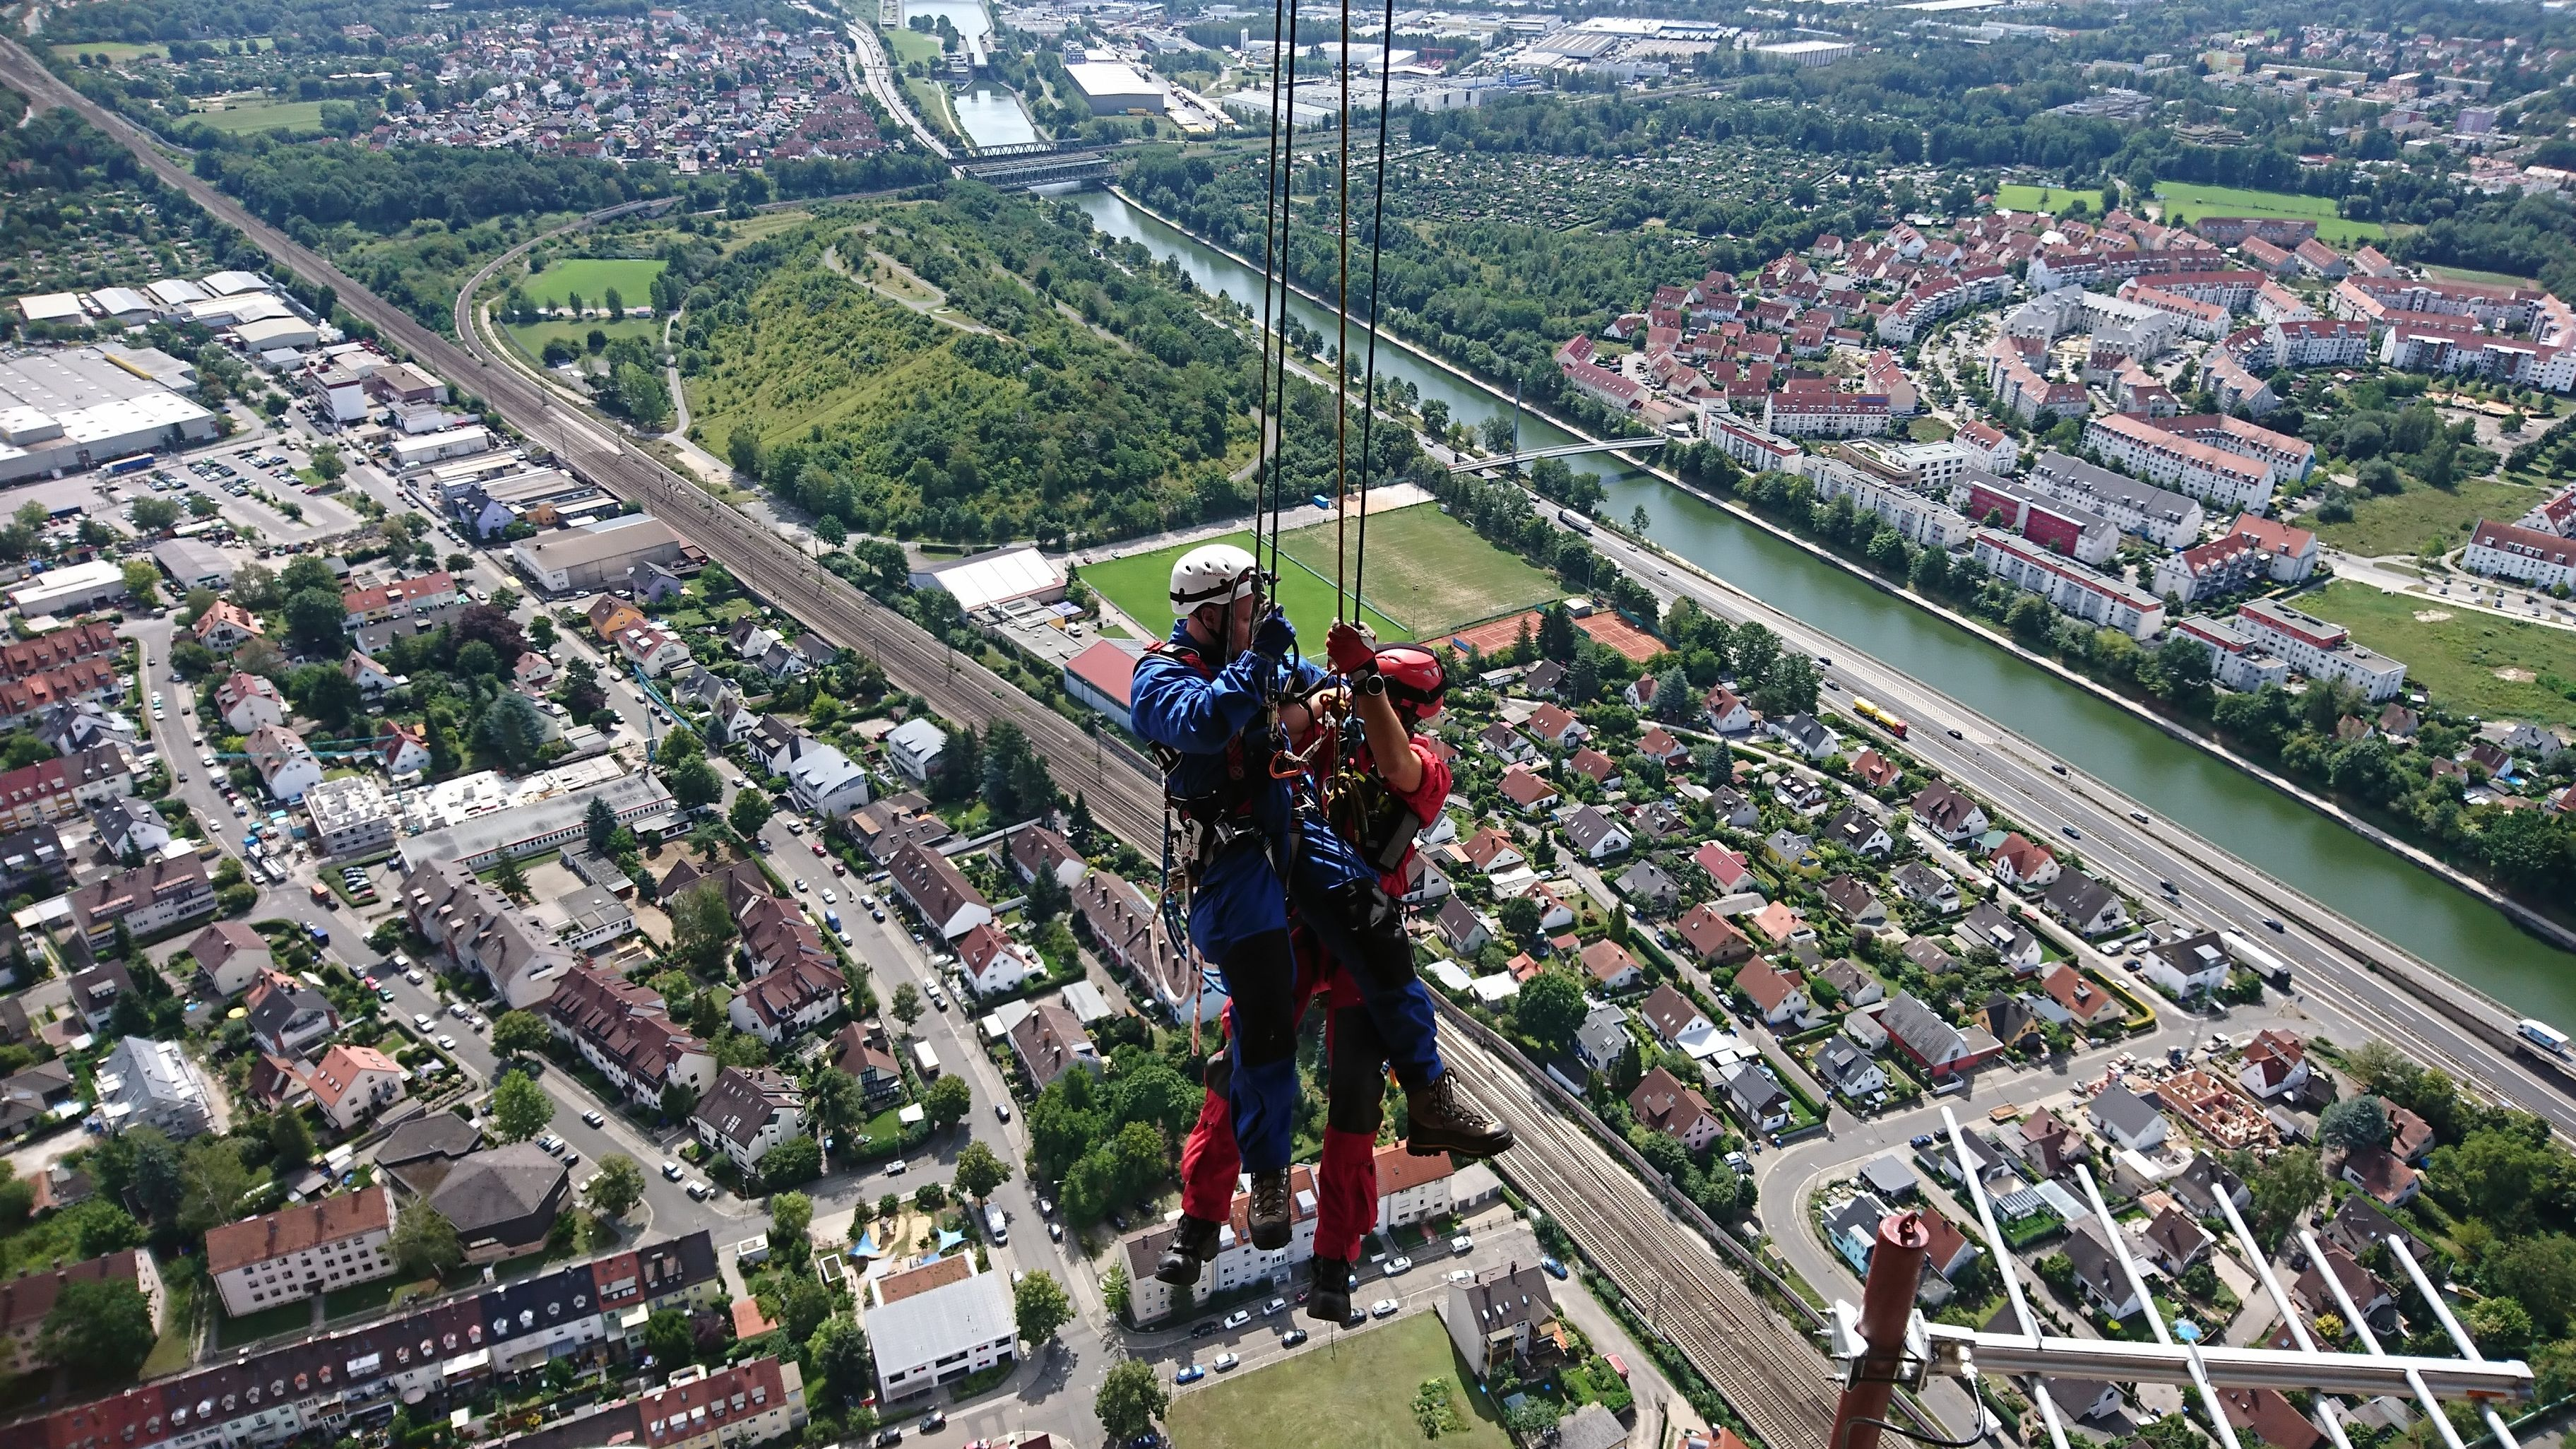 Höhenretter über Nürnberg: Sie trainieren derzeit am Nürnberger Fernledeturm.